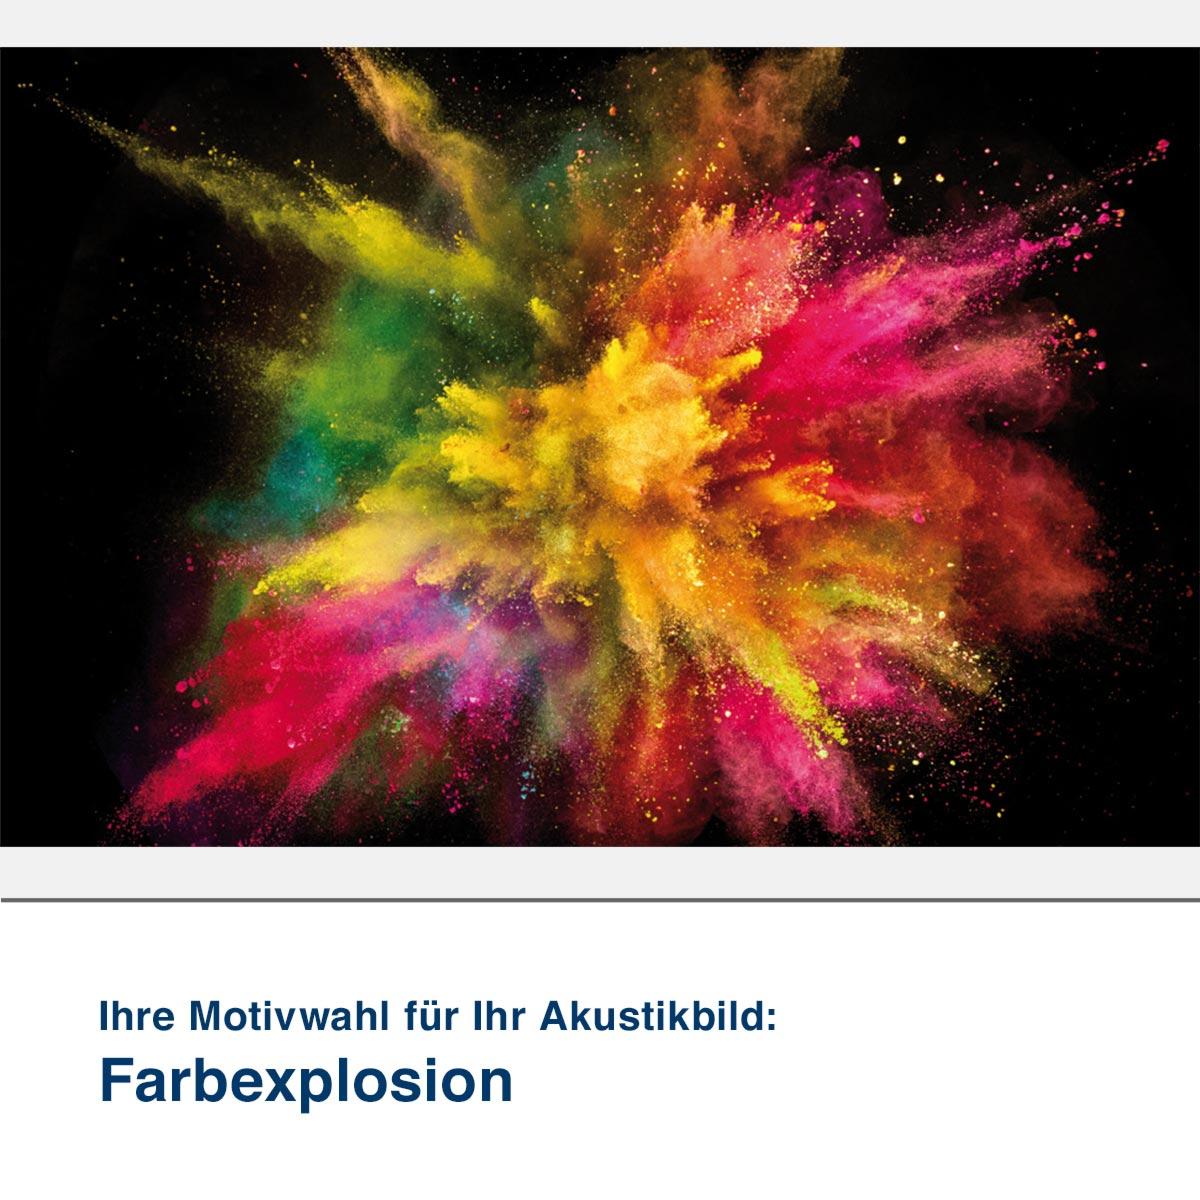 Akustikbild Motiv Farbexplosion